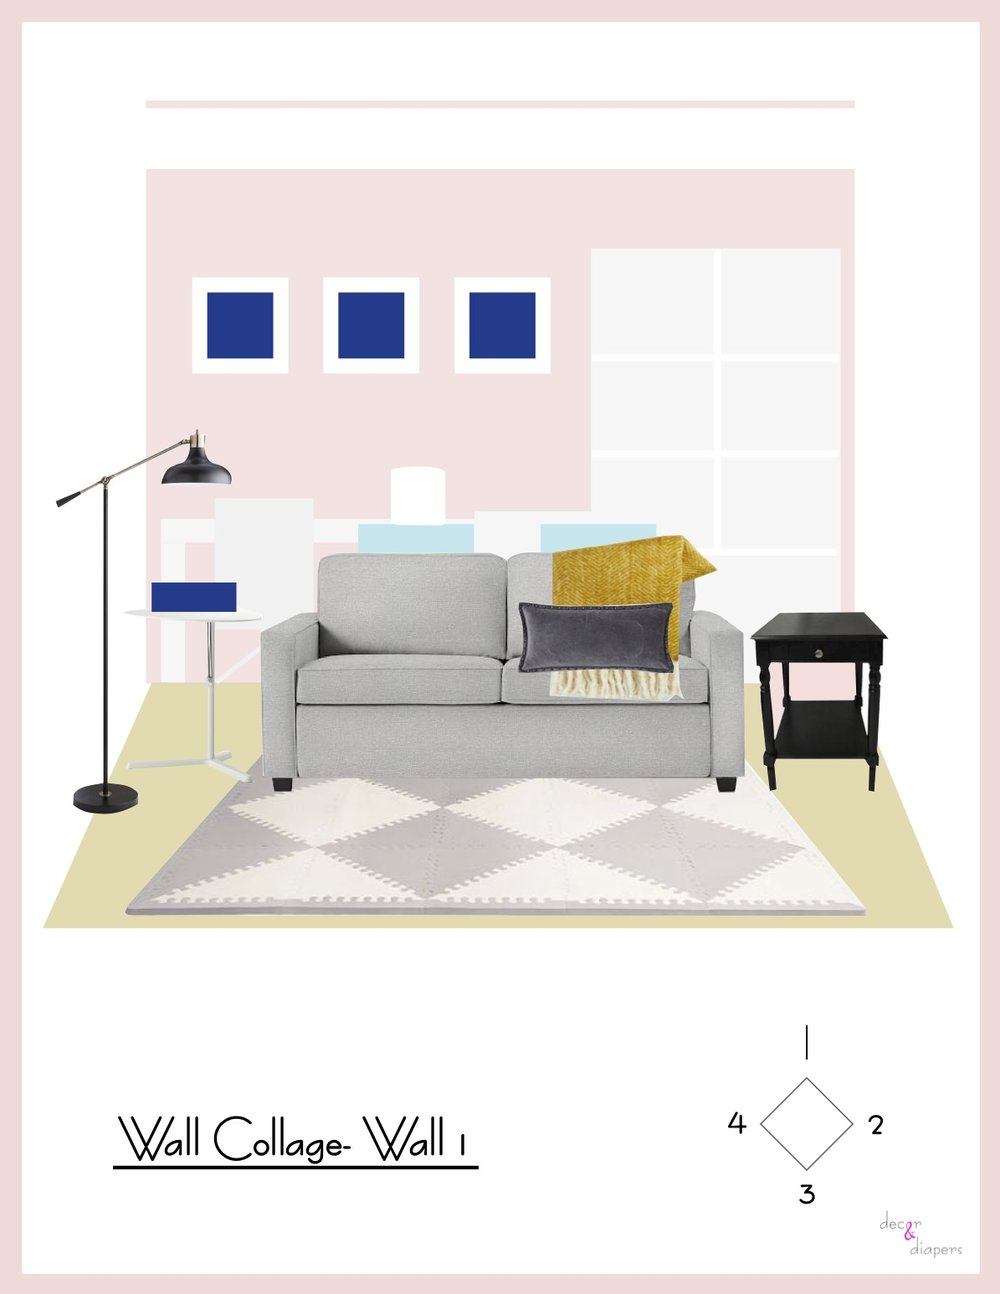 20181019 Henkin- living rm- wall collage- wall 1- update.jpg